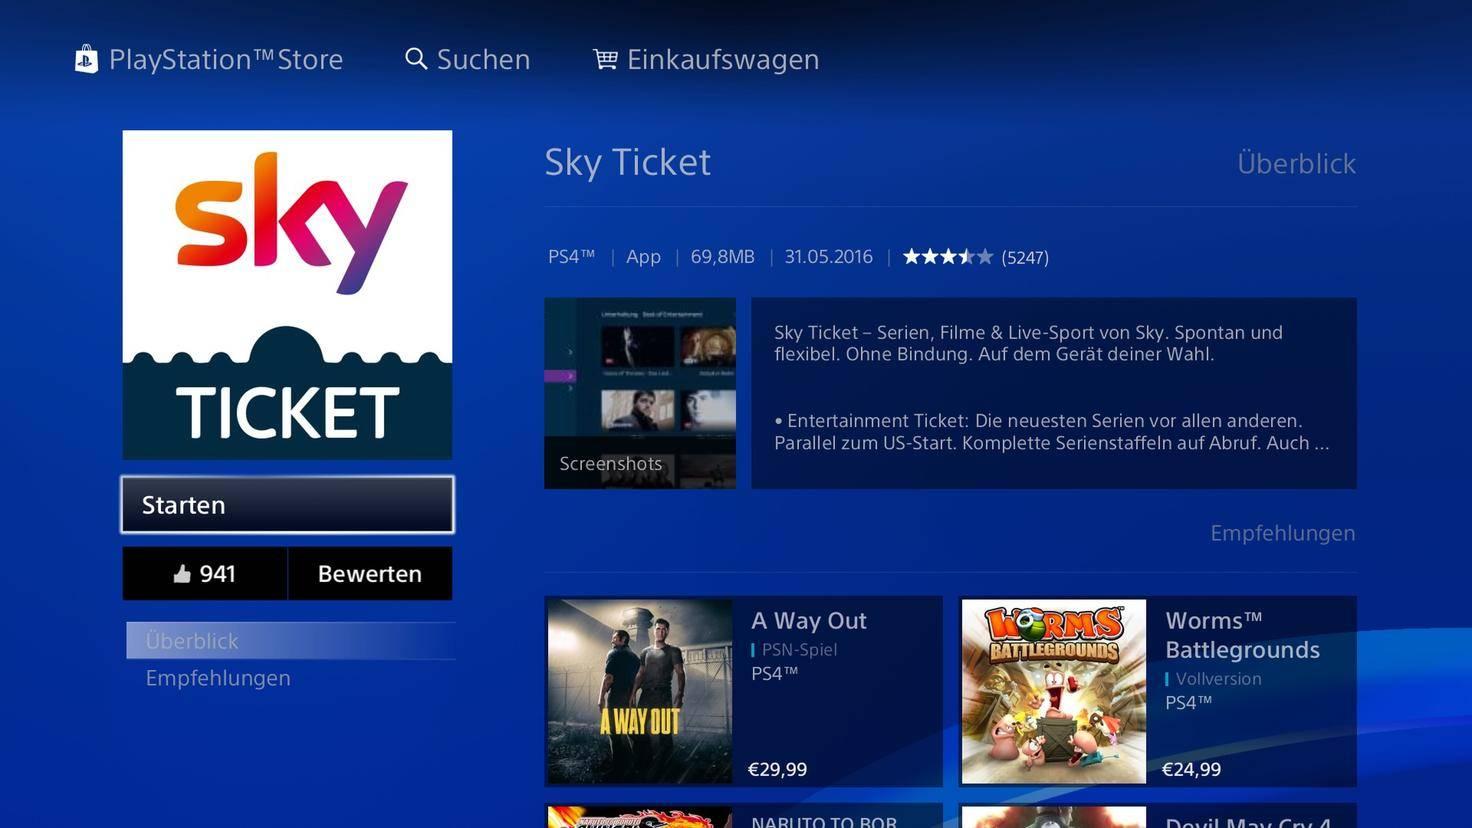 PlayStation Sky Ticket 4